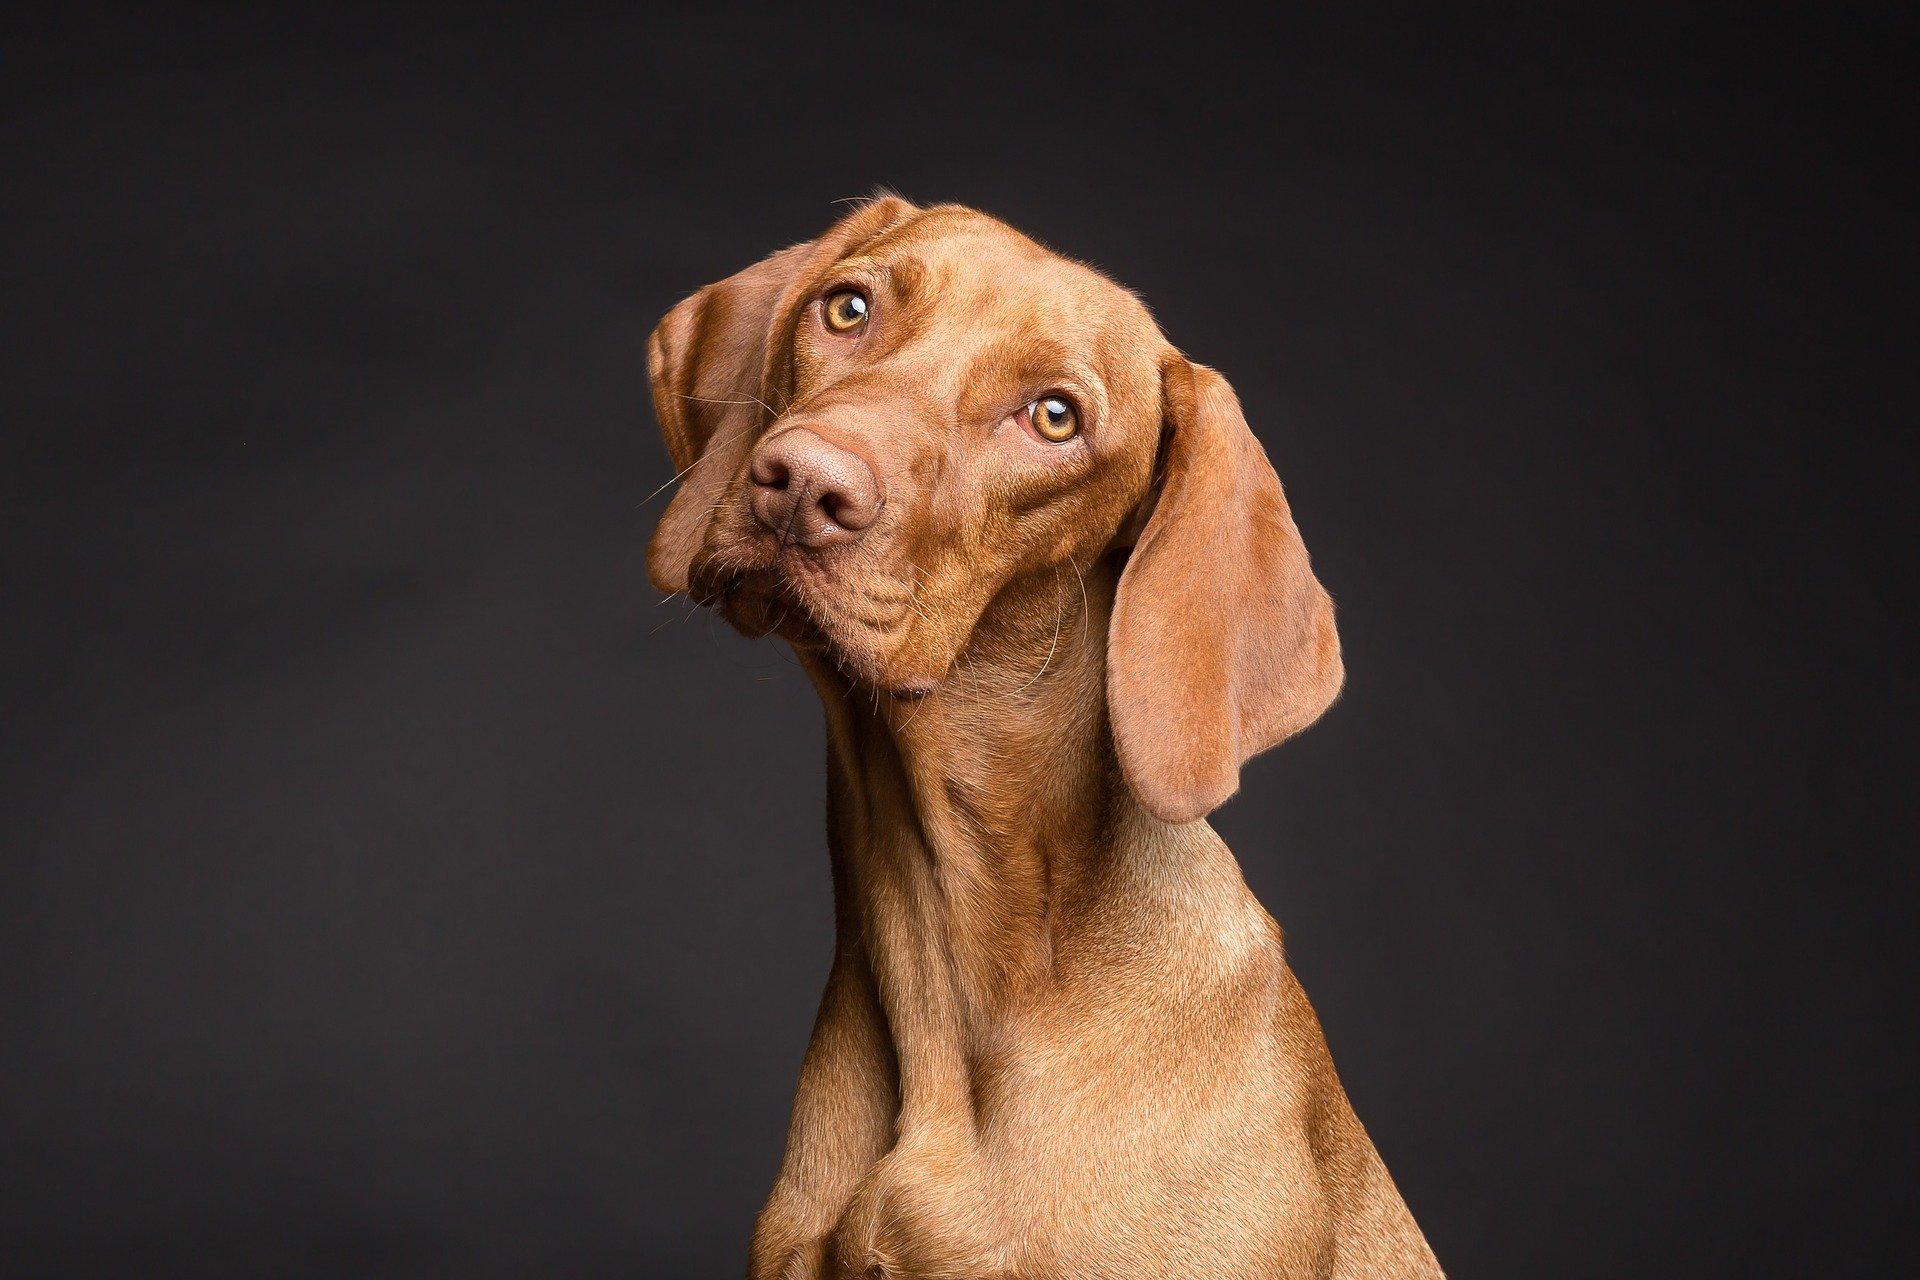 5 razones de porque deberías prevenir la Leishmaniosis canina